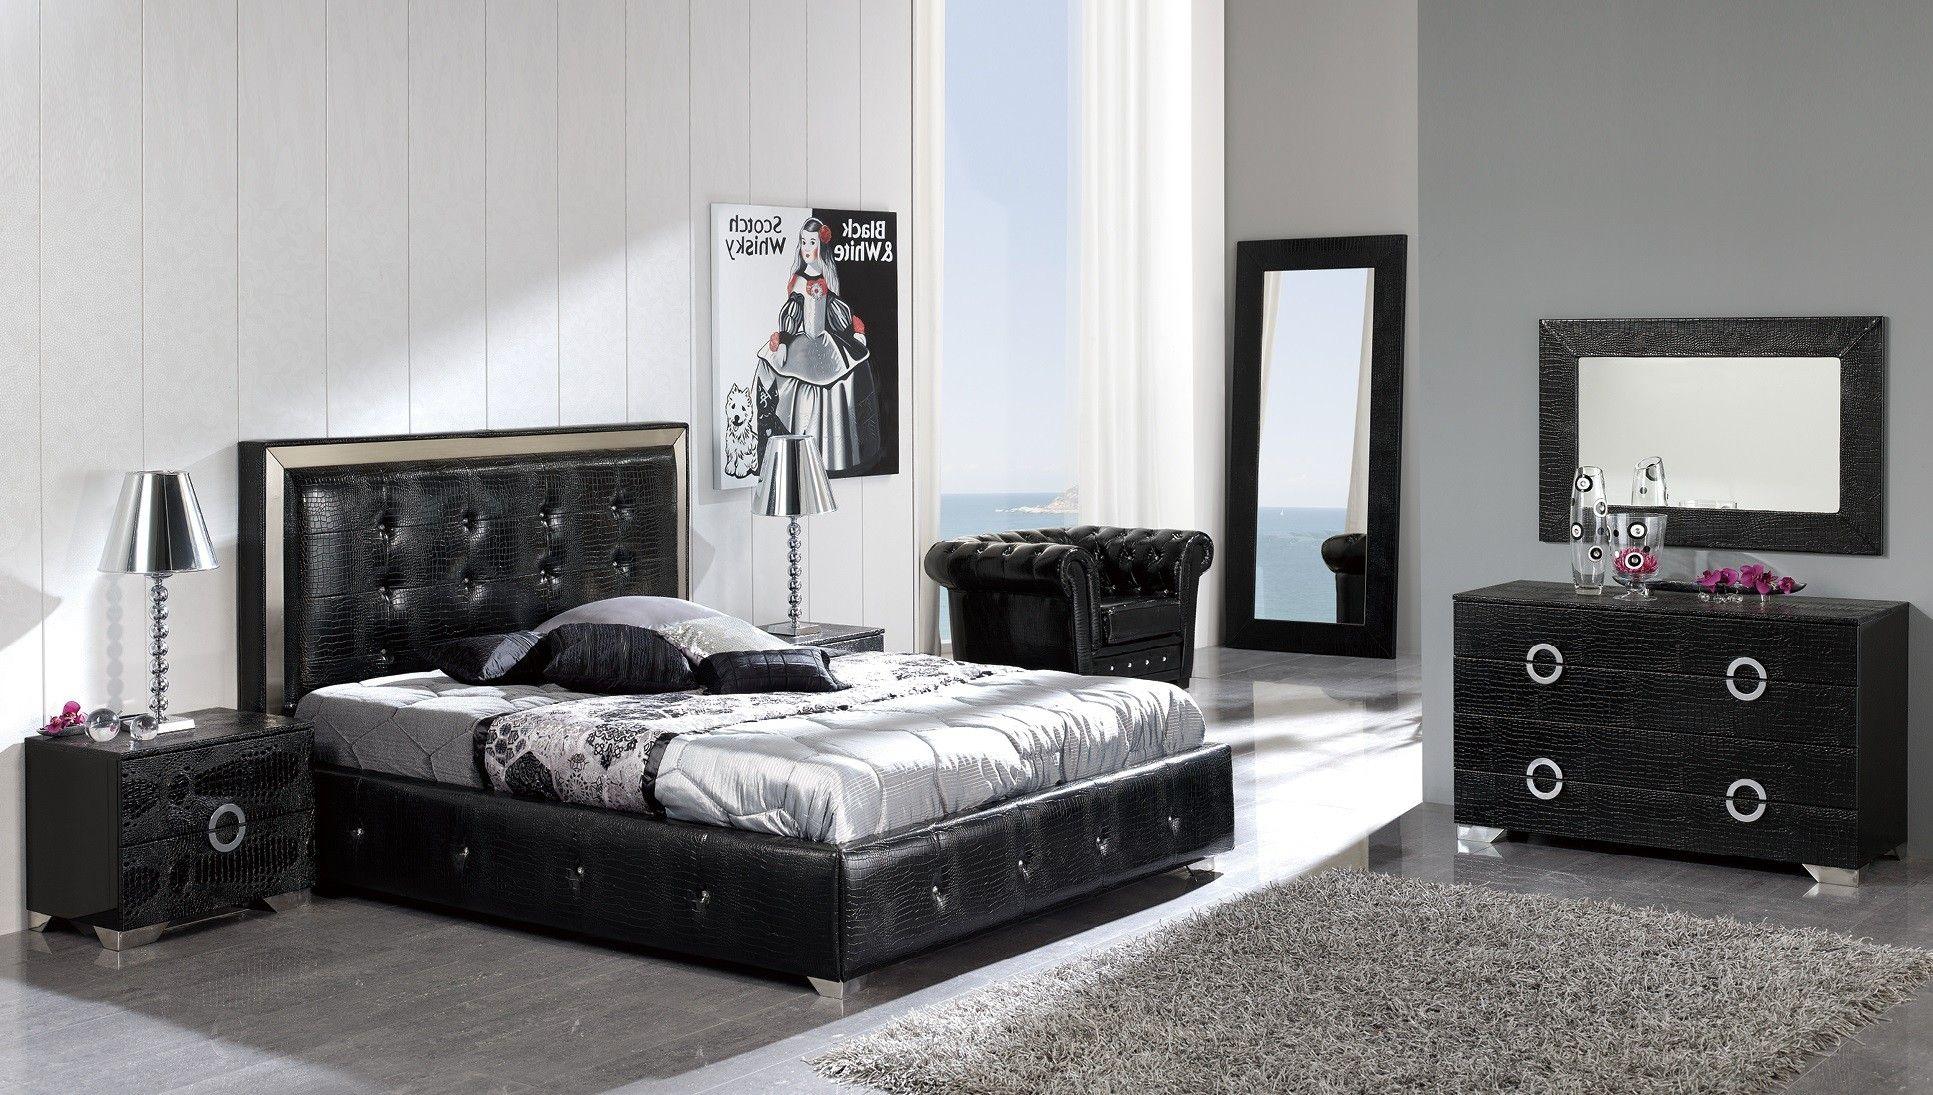 Coco Black Bedroom set - Modern with a dark edge  Modern bedroom